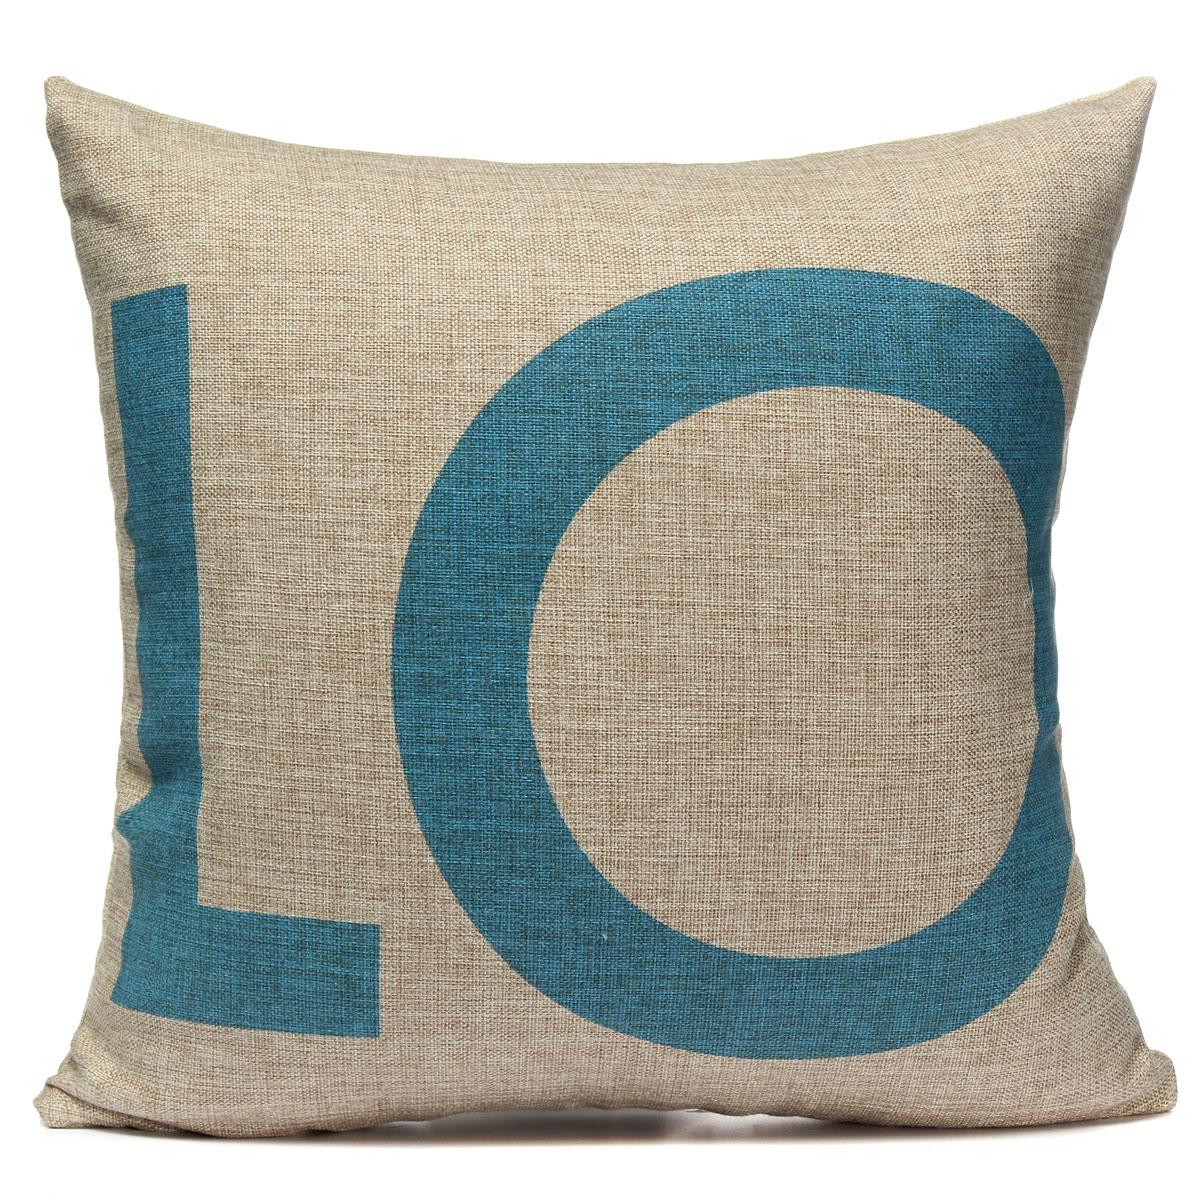 Throw Pillow Love : Cotton Linen LOVE Throw Pillow Case Car Cushion Cover Home Decor Valentine s Day